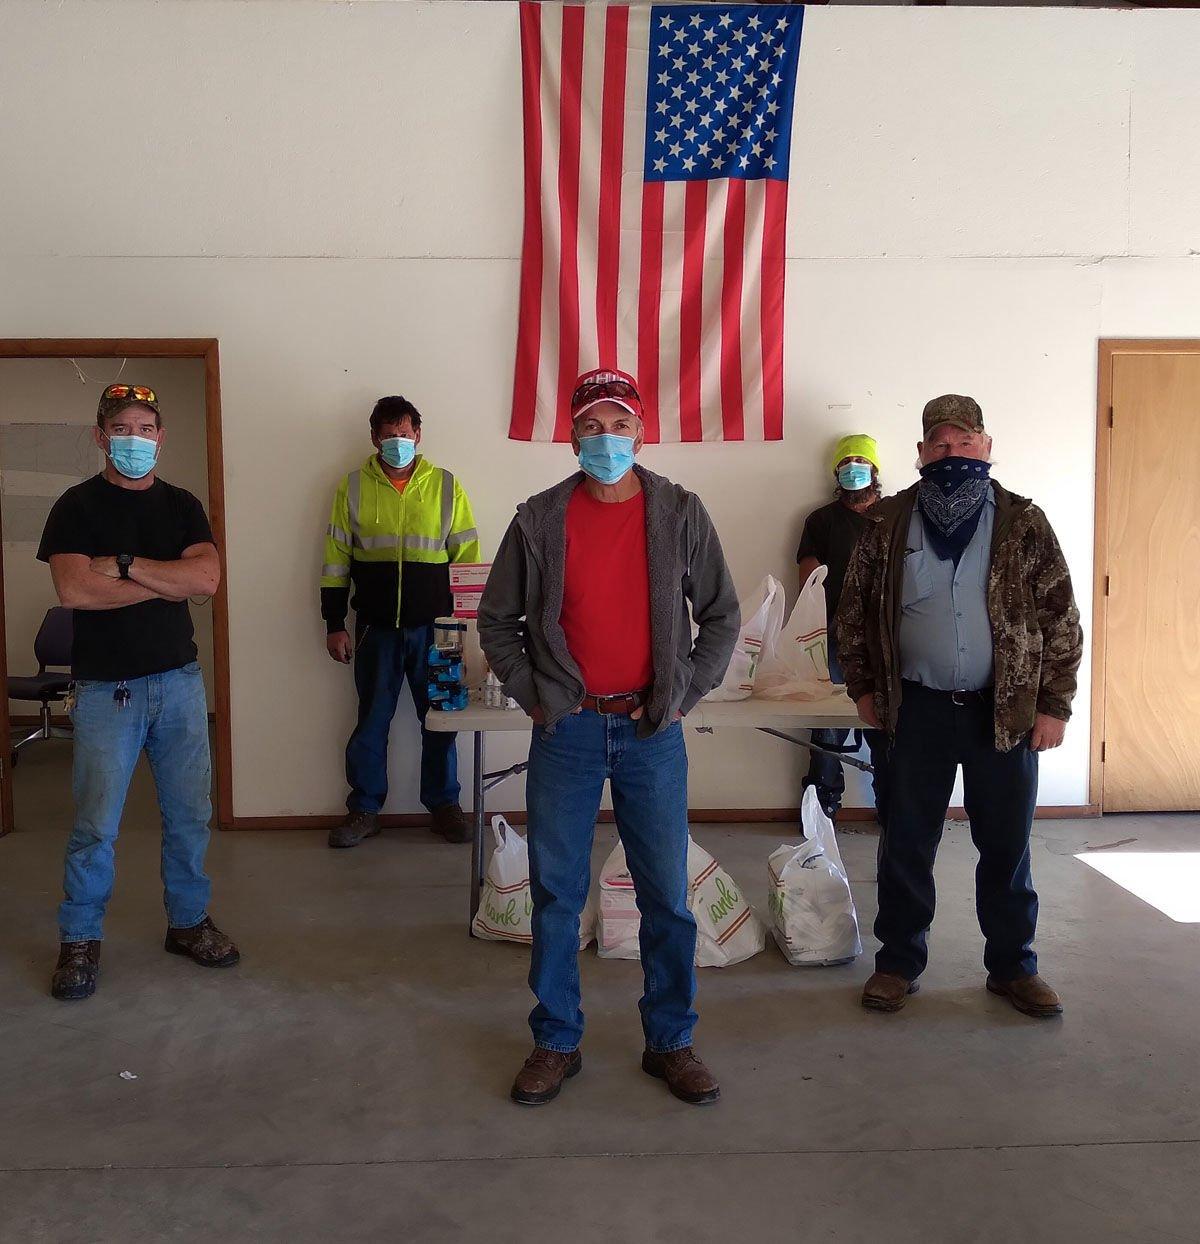 Camp Creek workers